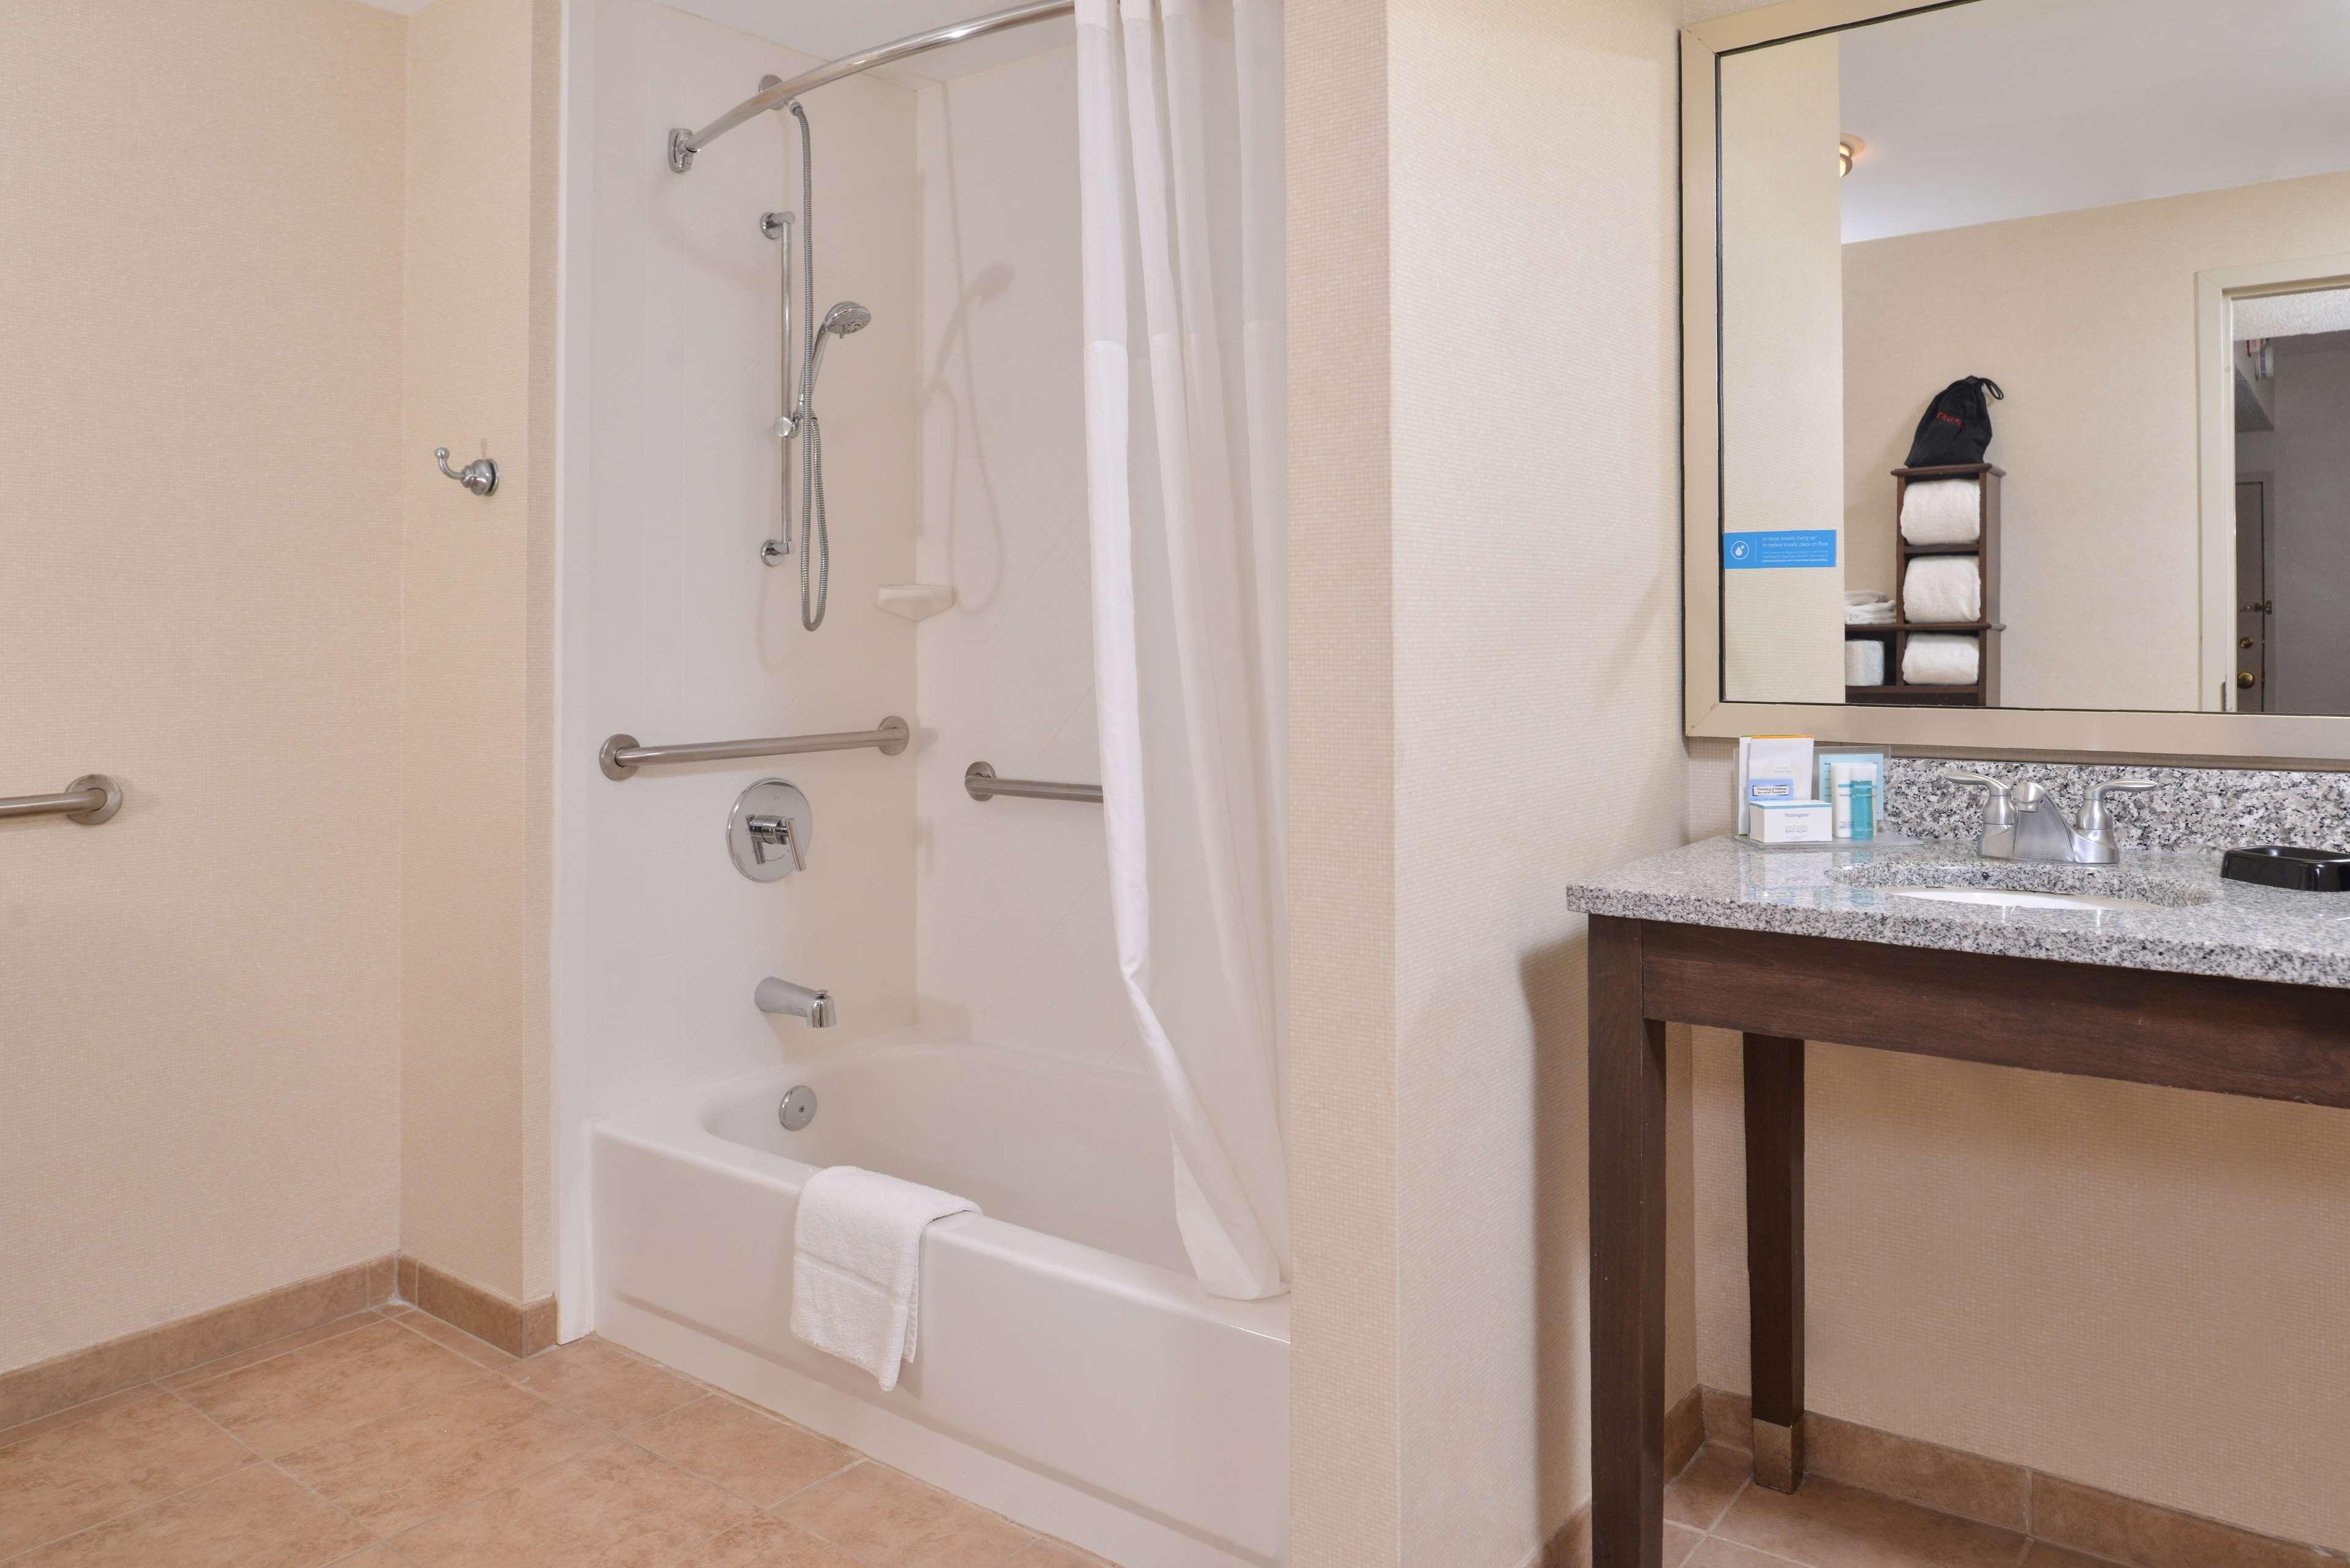 Hampton Inn & Suites Newport News (Oyster Point) image 24